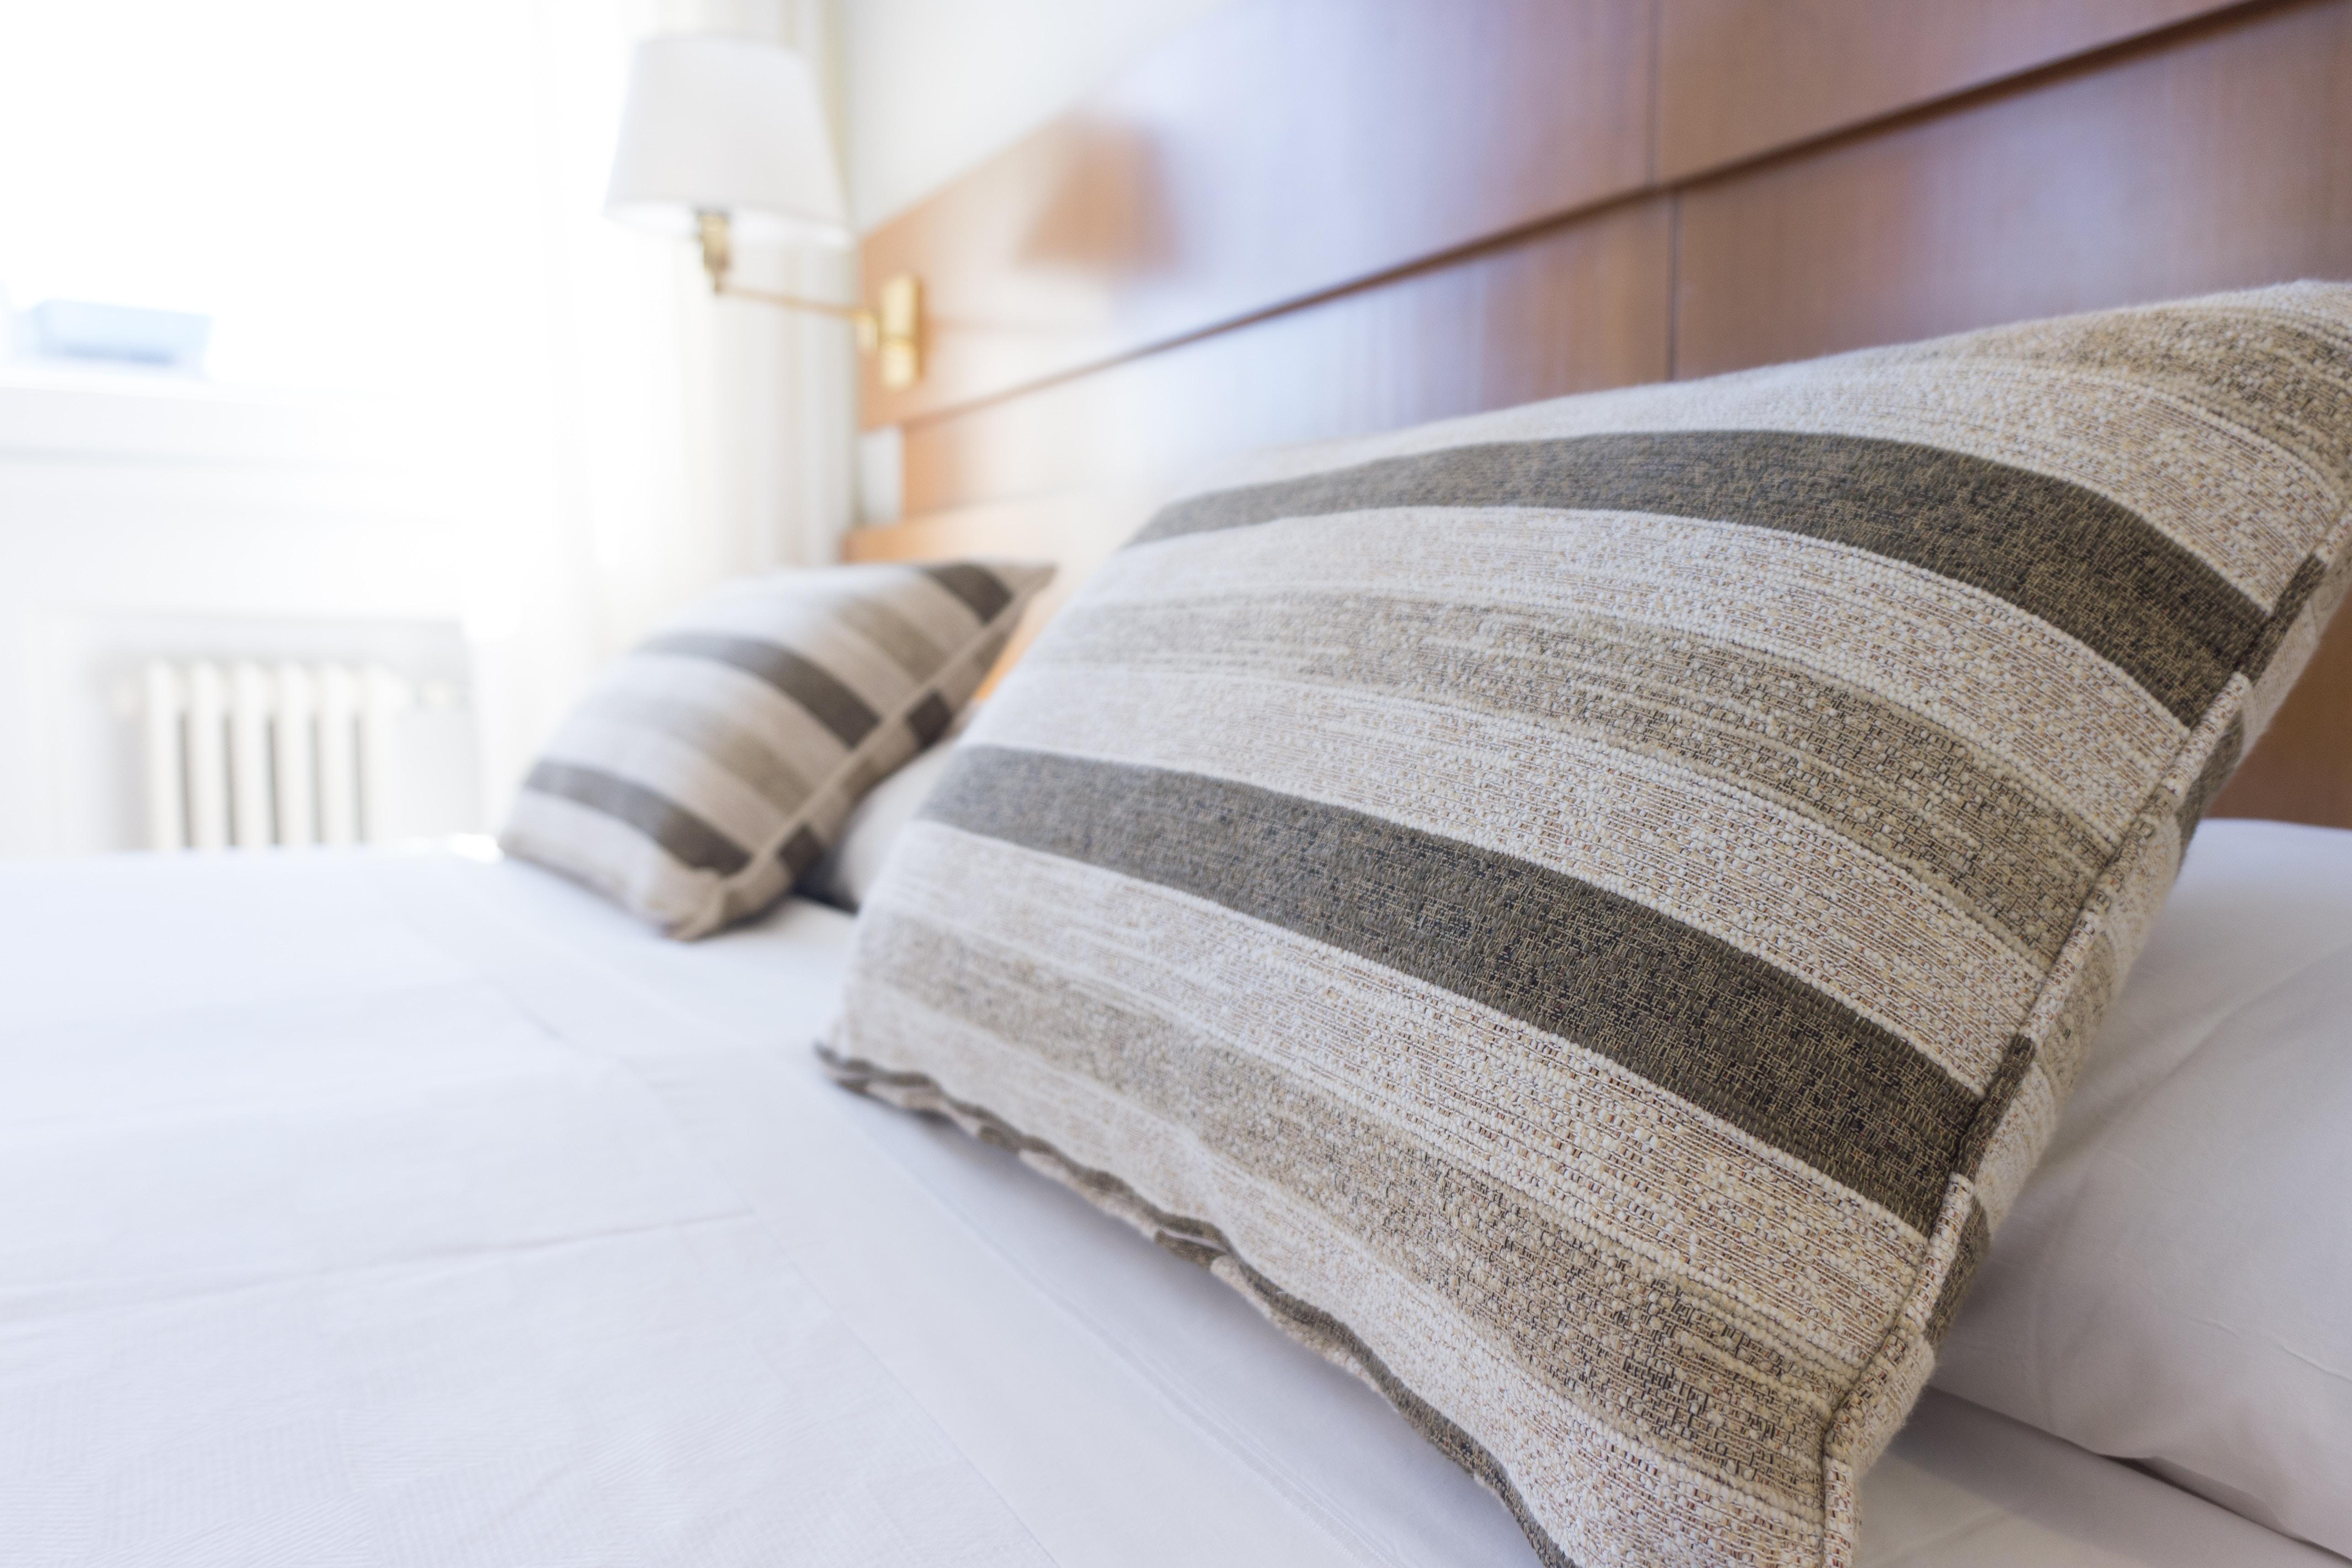 nik lanus YMOHw3F1Hdk unsplash Hoteles en Andalucia